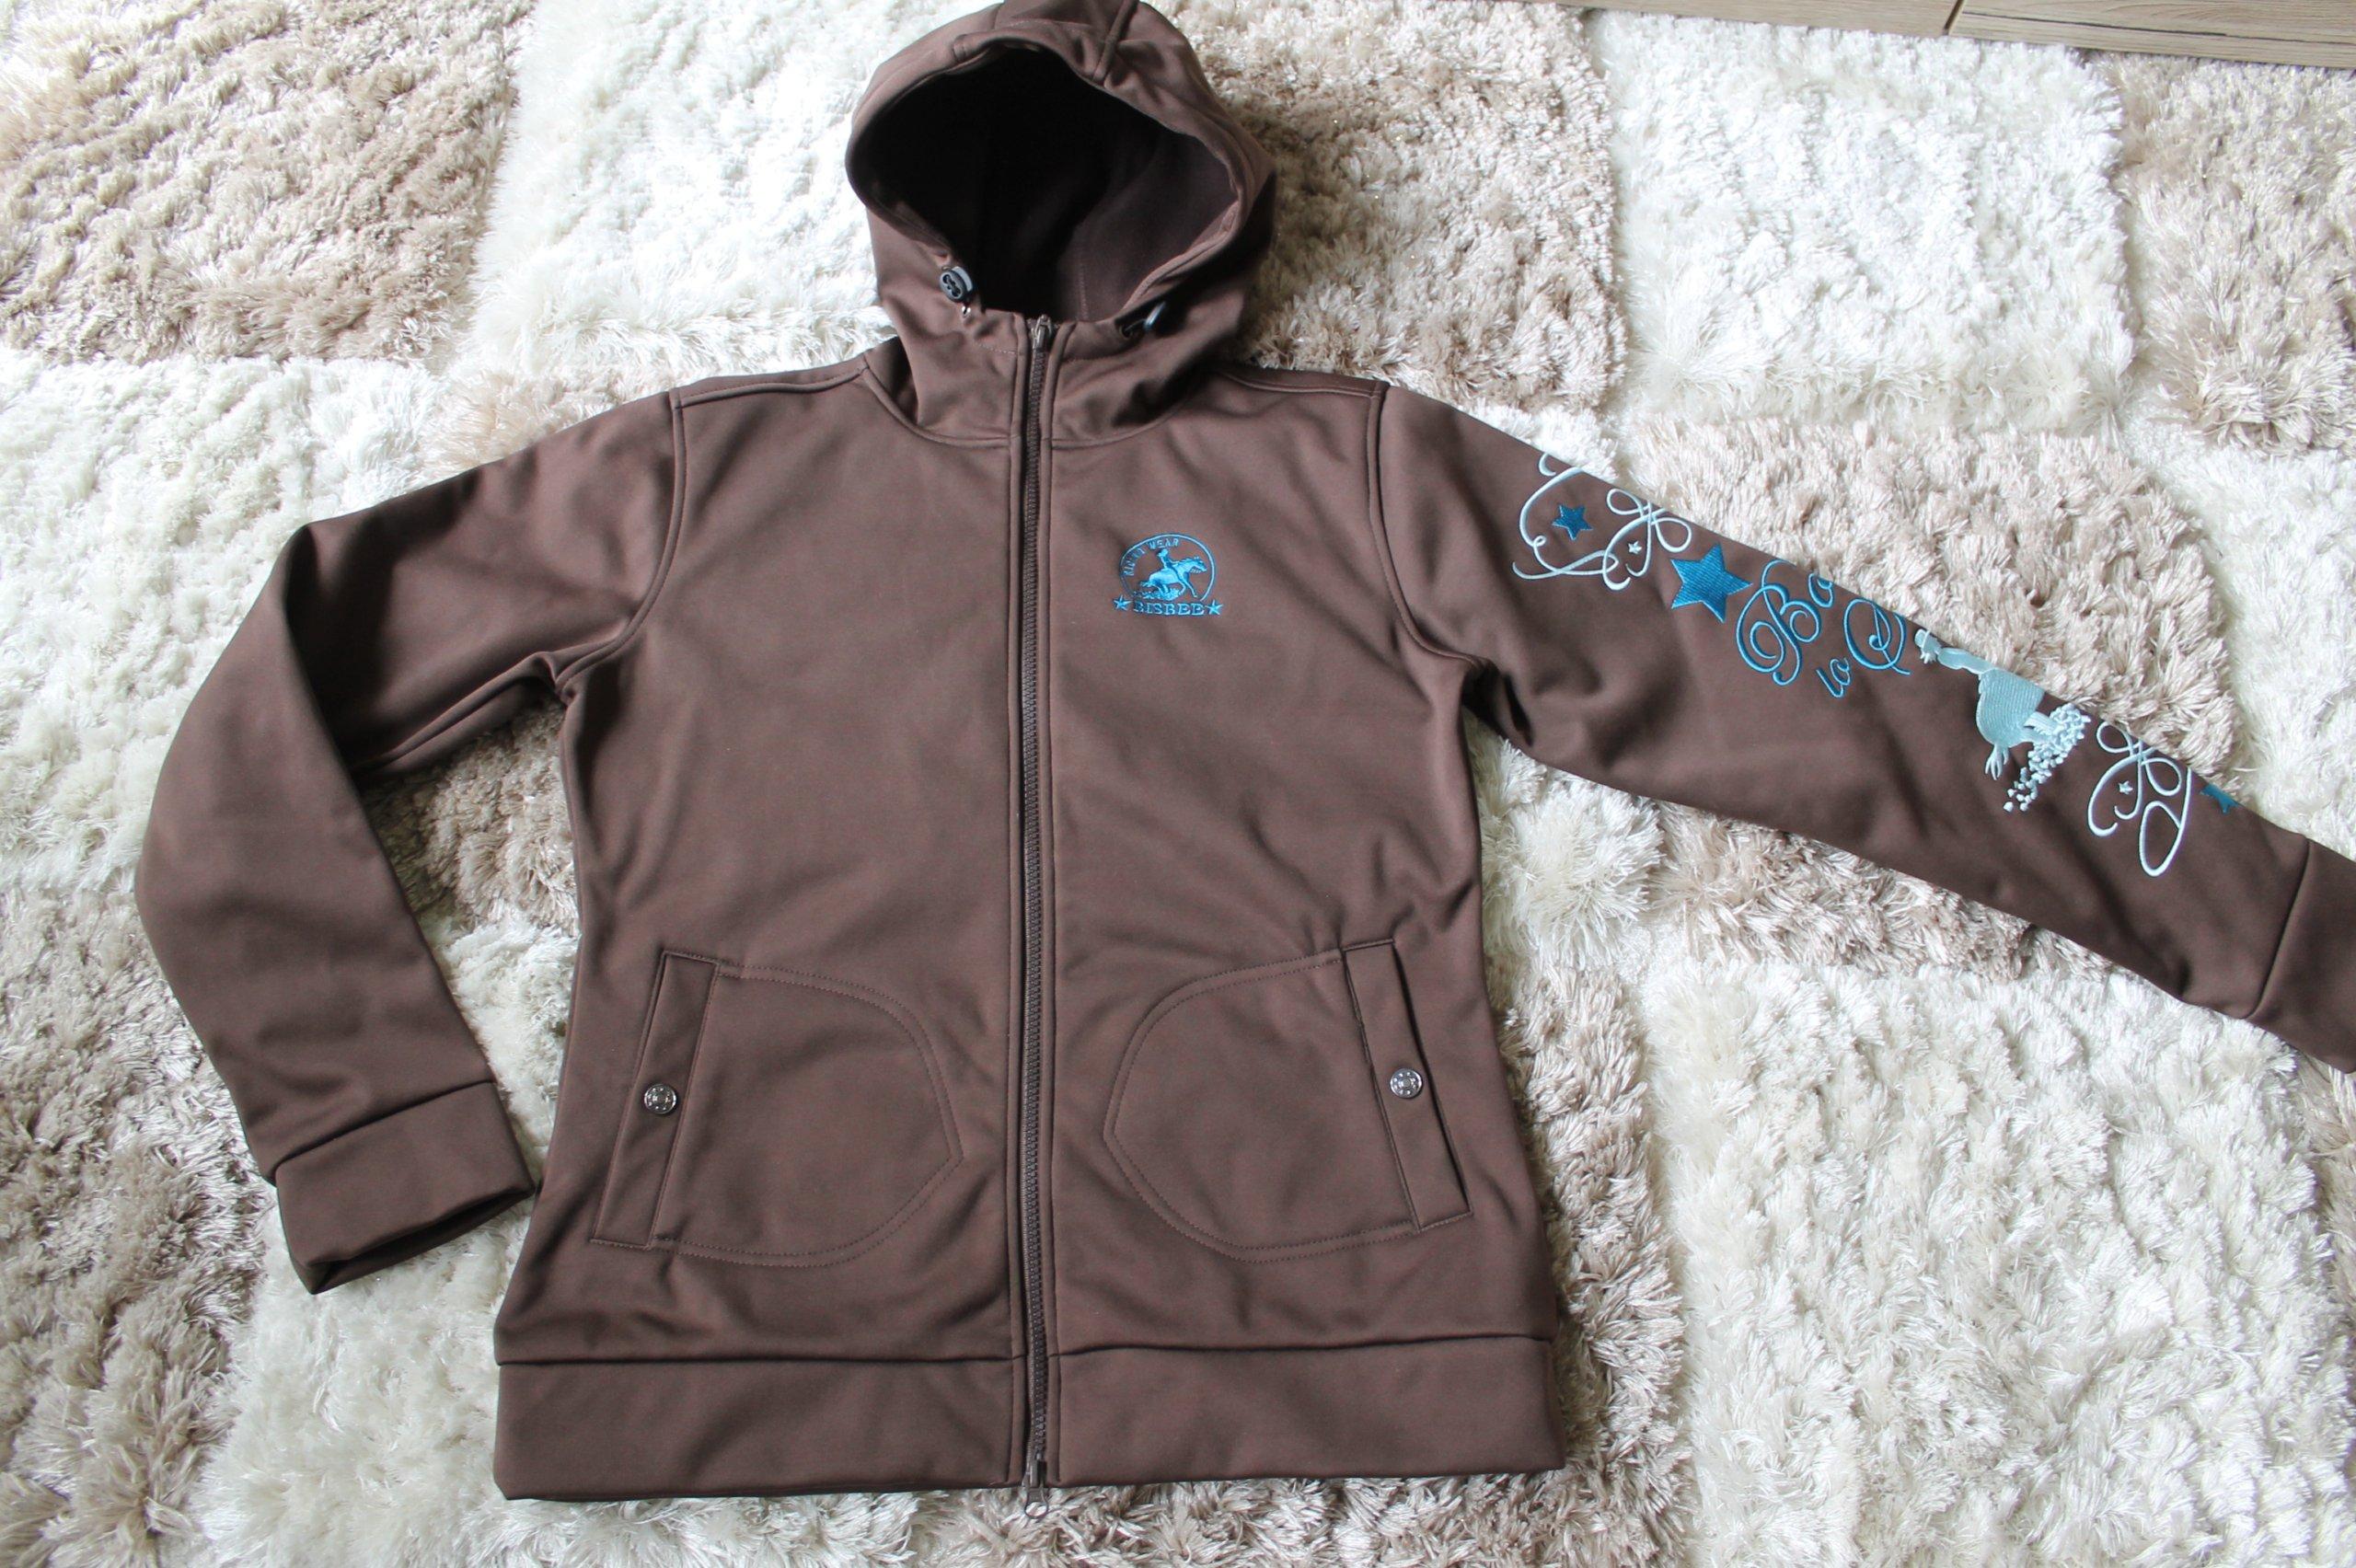 25eee7c37af6b Softshell ocieplany / jacket jeździecki Bisbee- M - 7245604256 ...